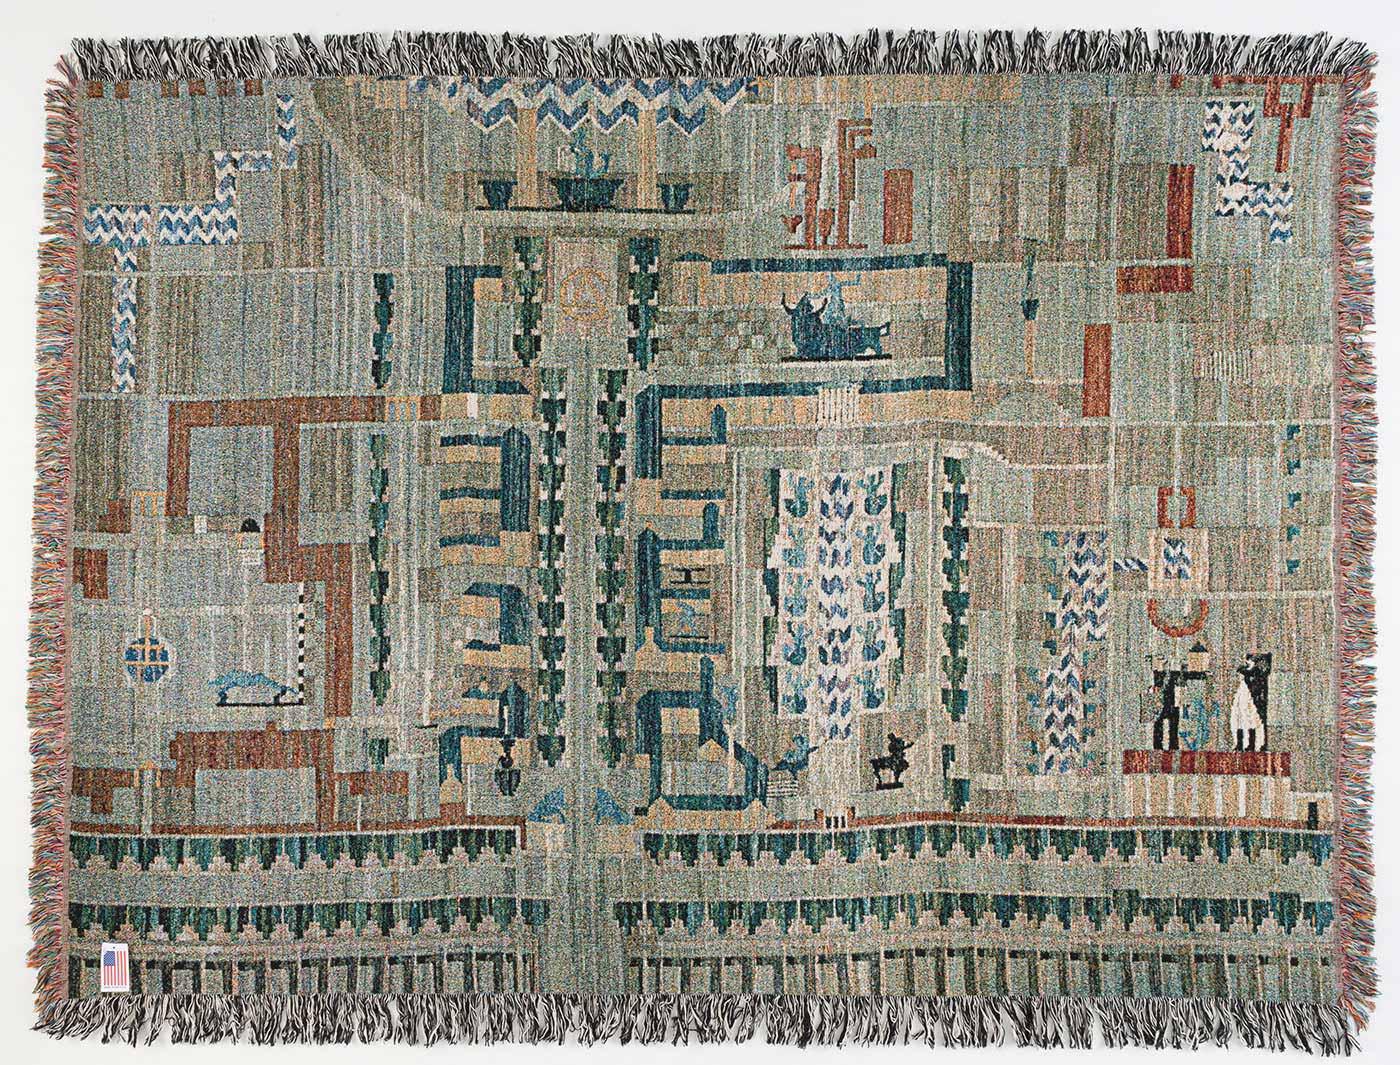 Anthony Warnick - Cranbrook Map Tapestry (after Loja Saarinen)